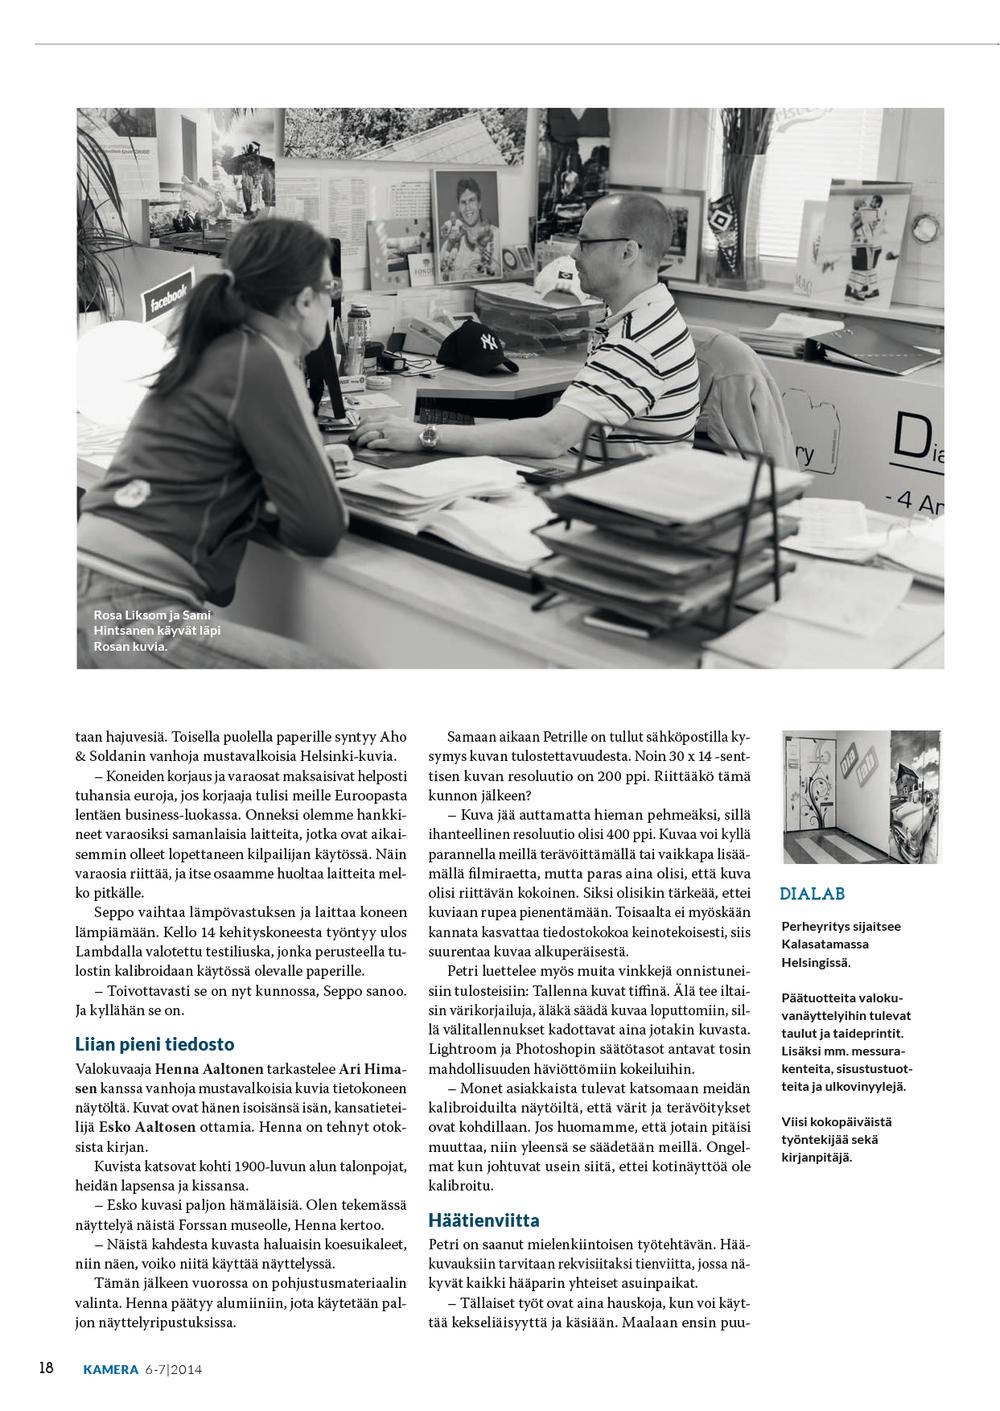 Kuvapäivä_Kamera-lehti_6-7-2014.pdf-3.jpg